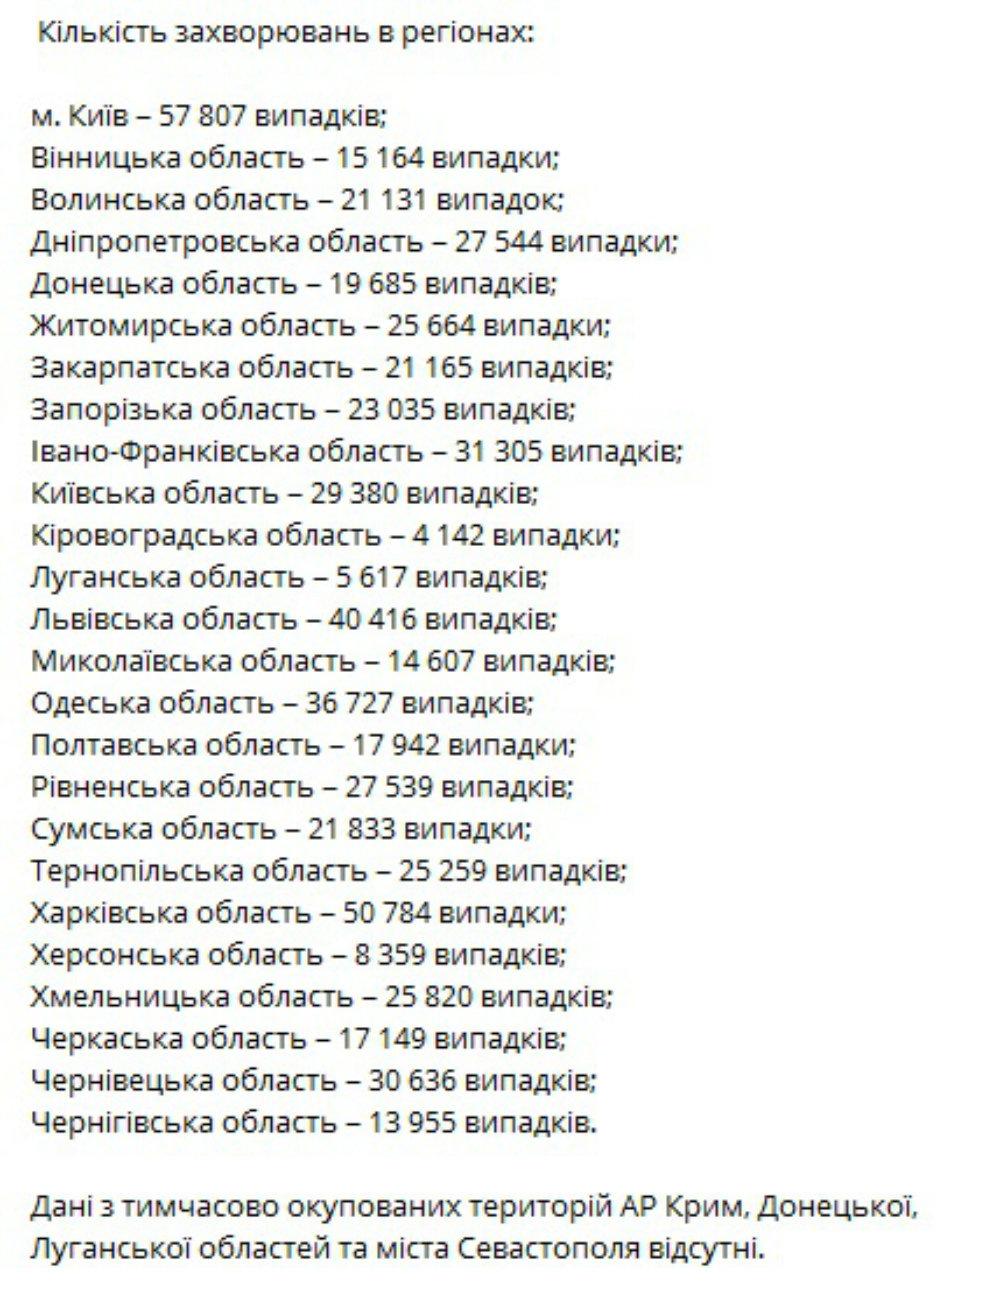 Статистика по коронавирусу в Украине, В Украине новый рекорд по заболевшим коронавирусом